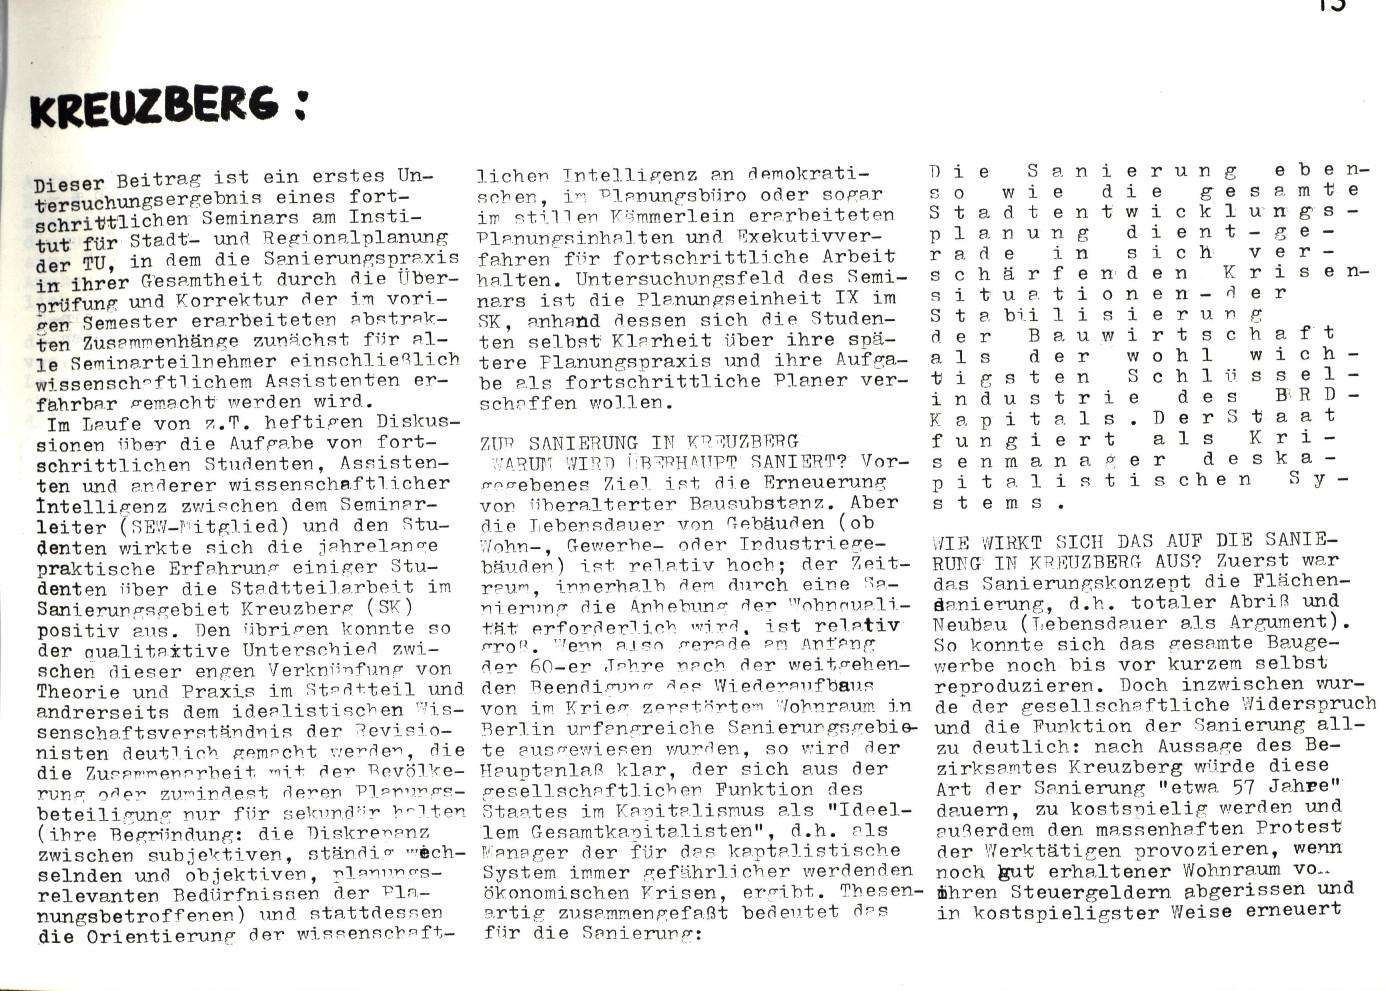 Berlin_KSV_1974_Rote_Bauwochen_22